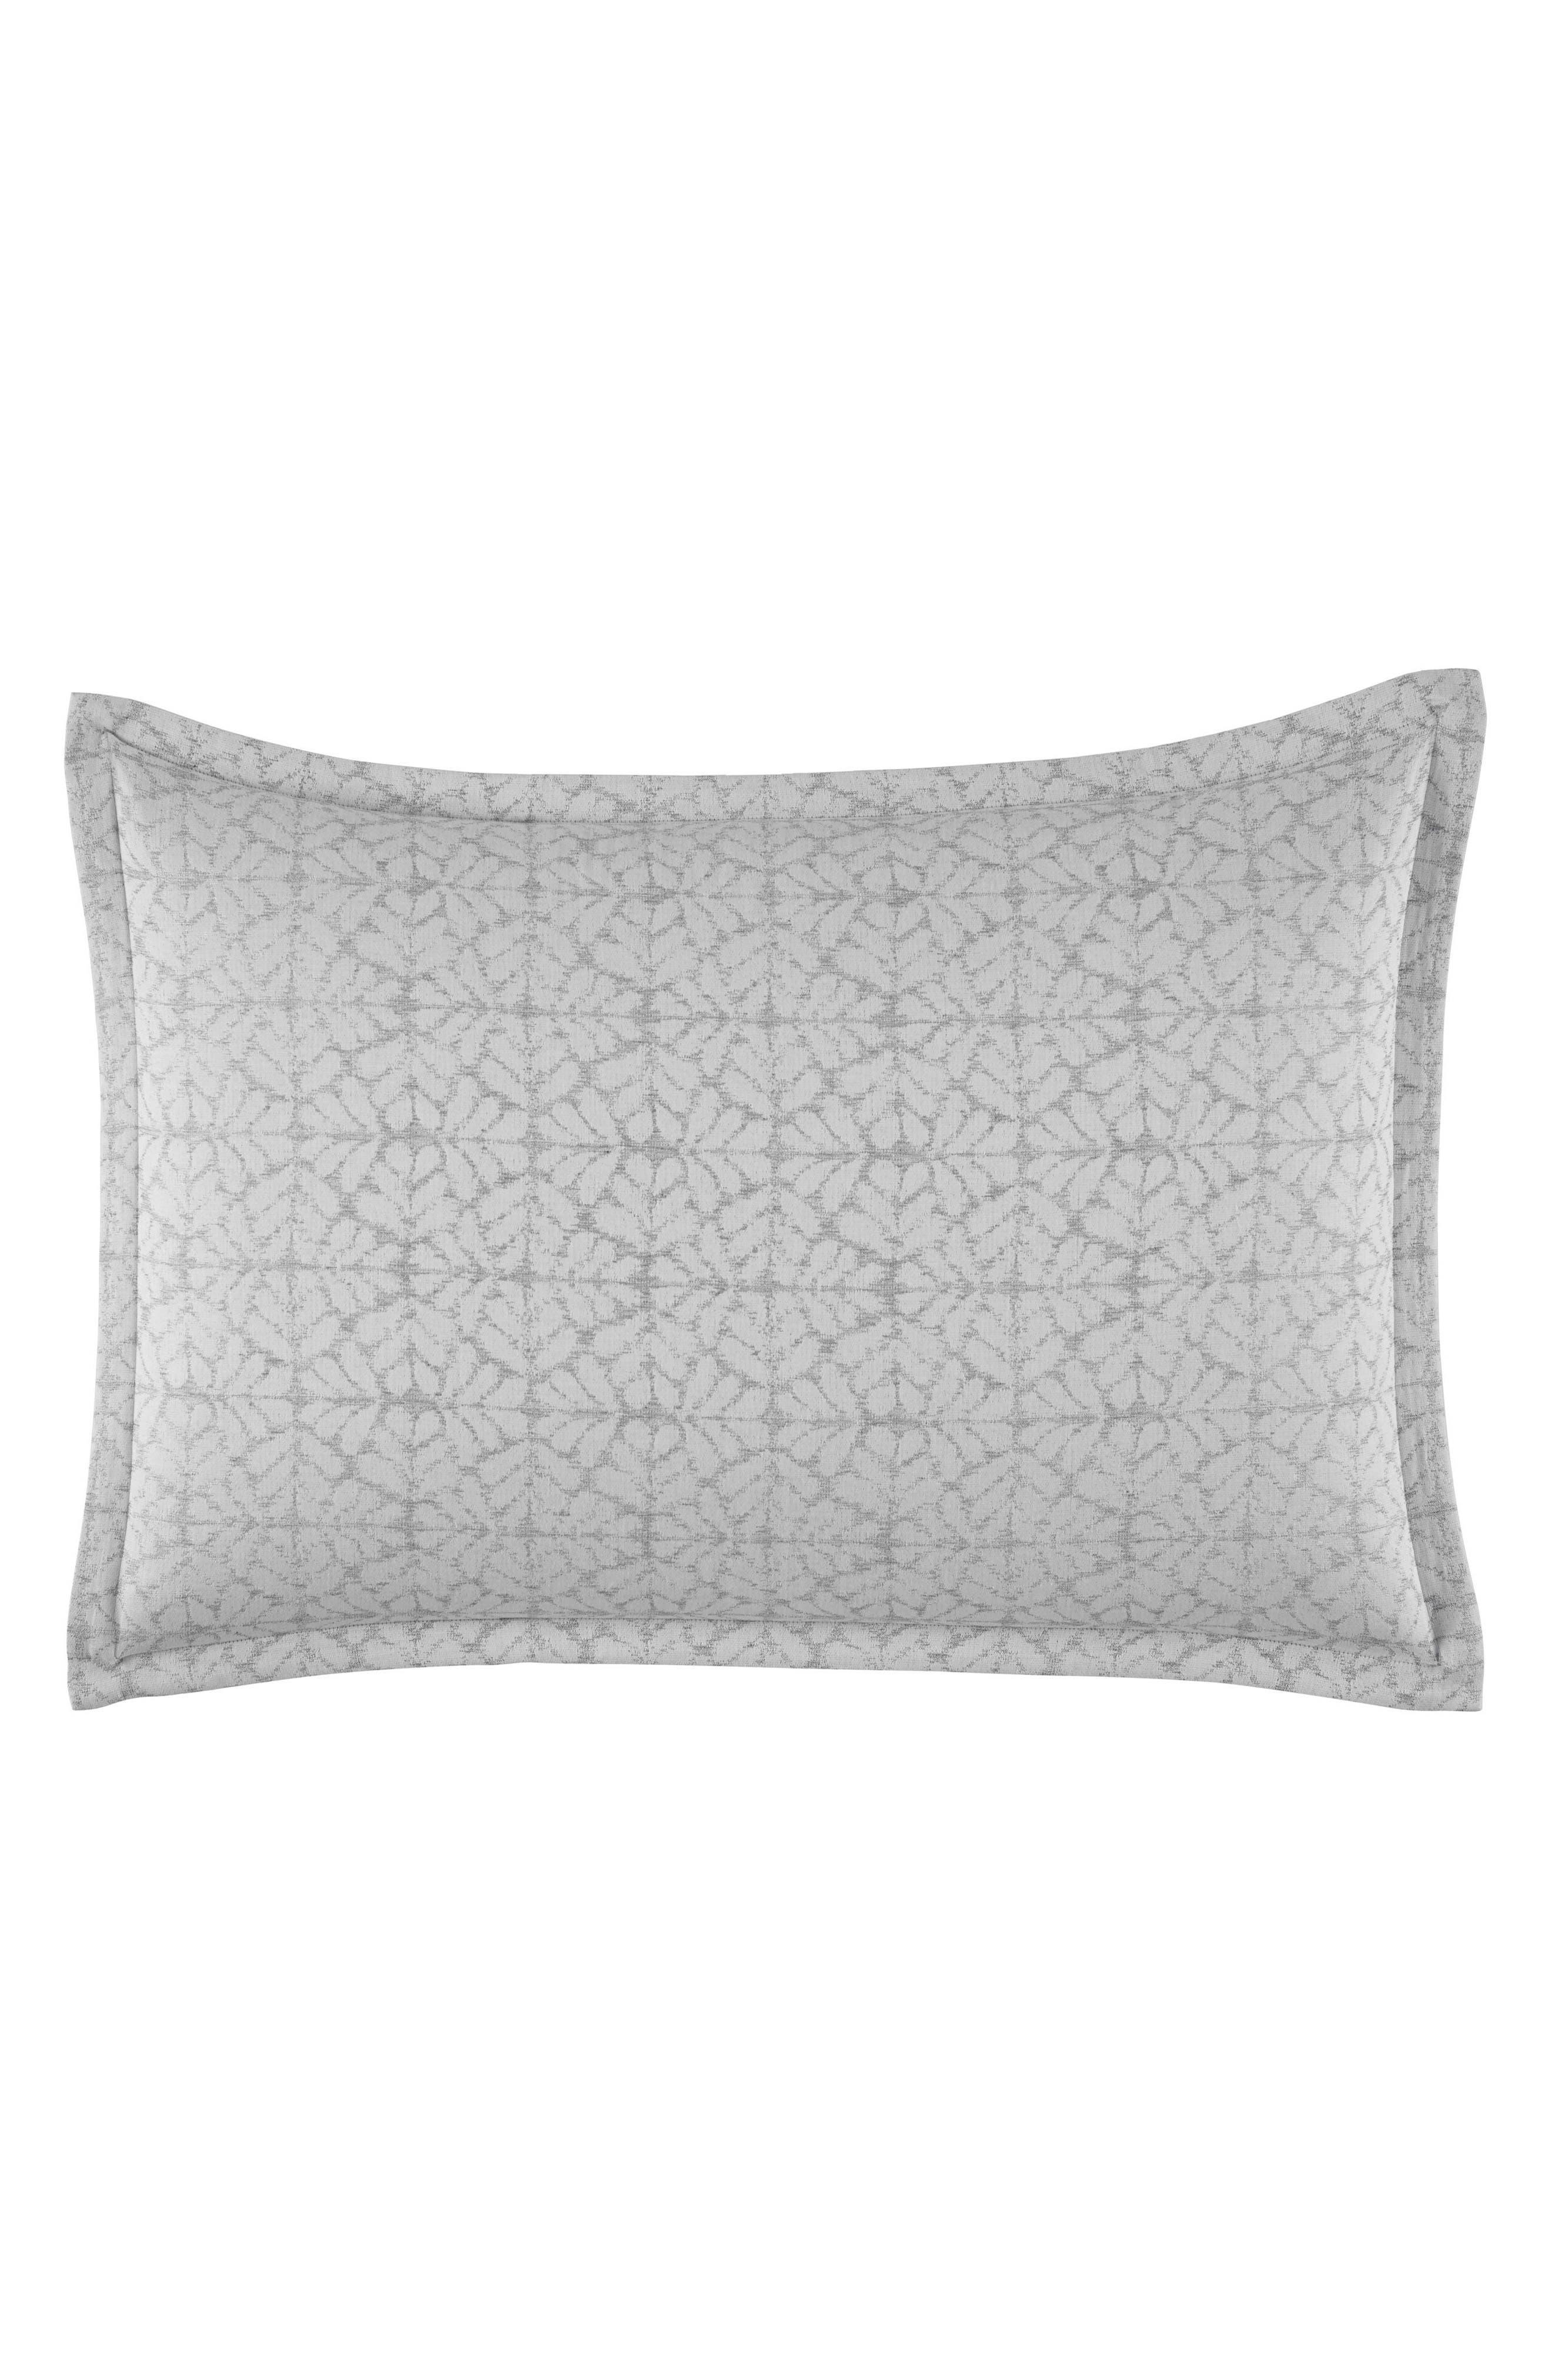 Mirrored Square Sham,                         Main,                         color, Grey